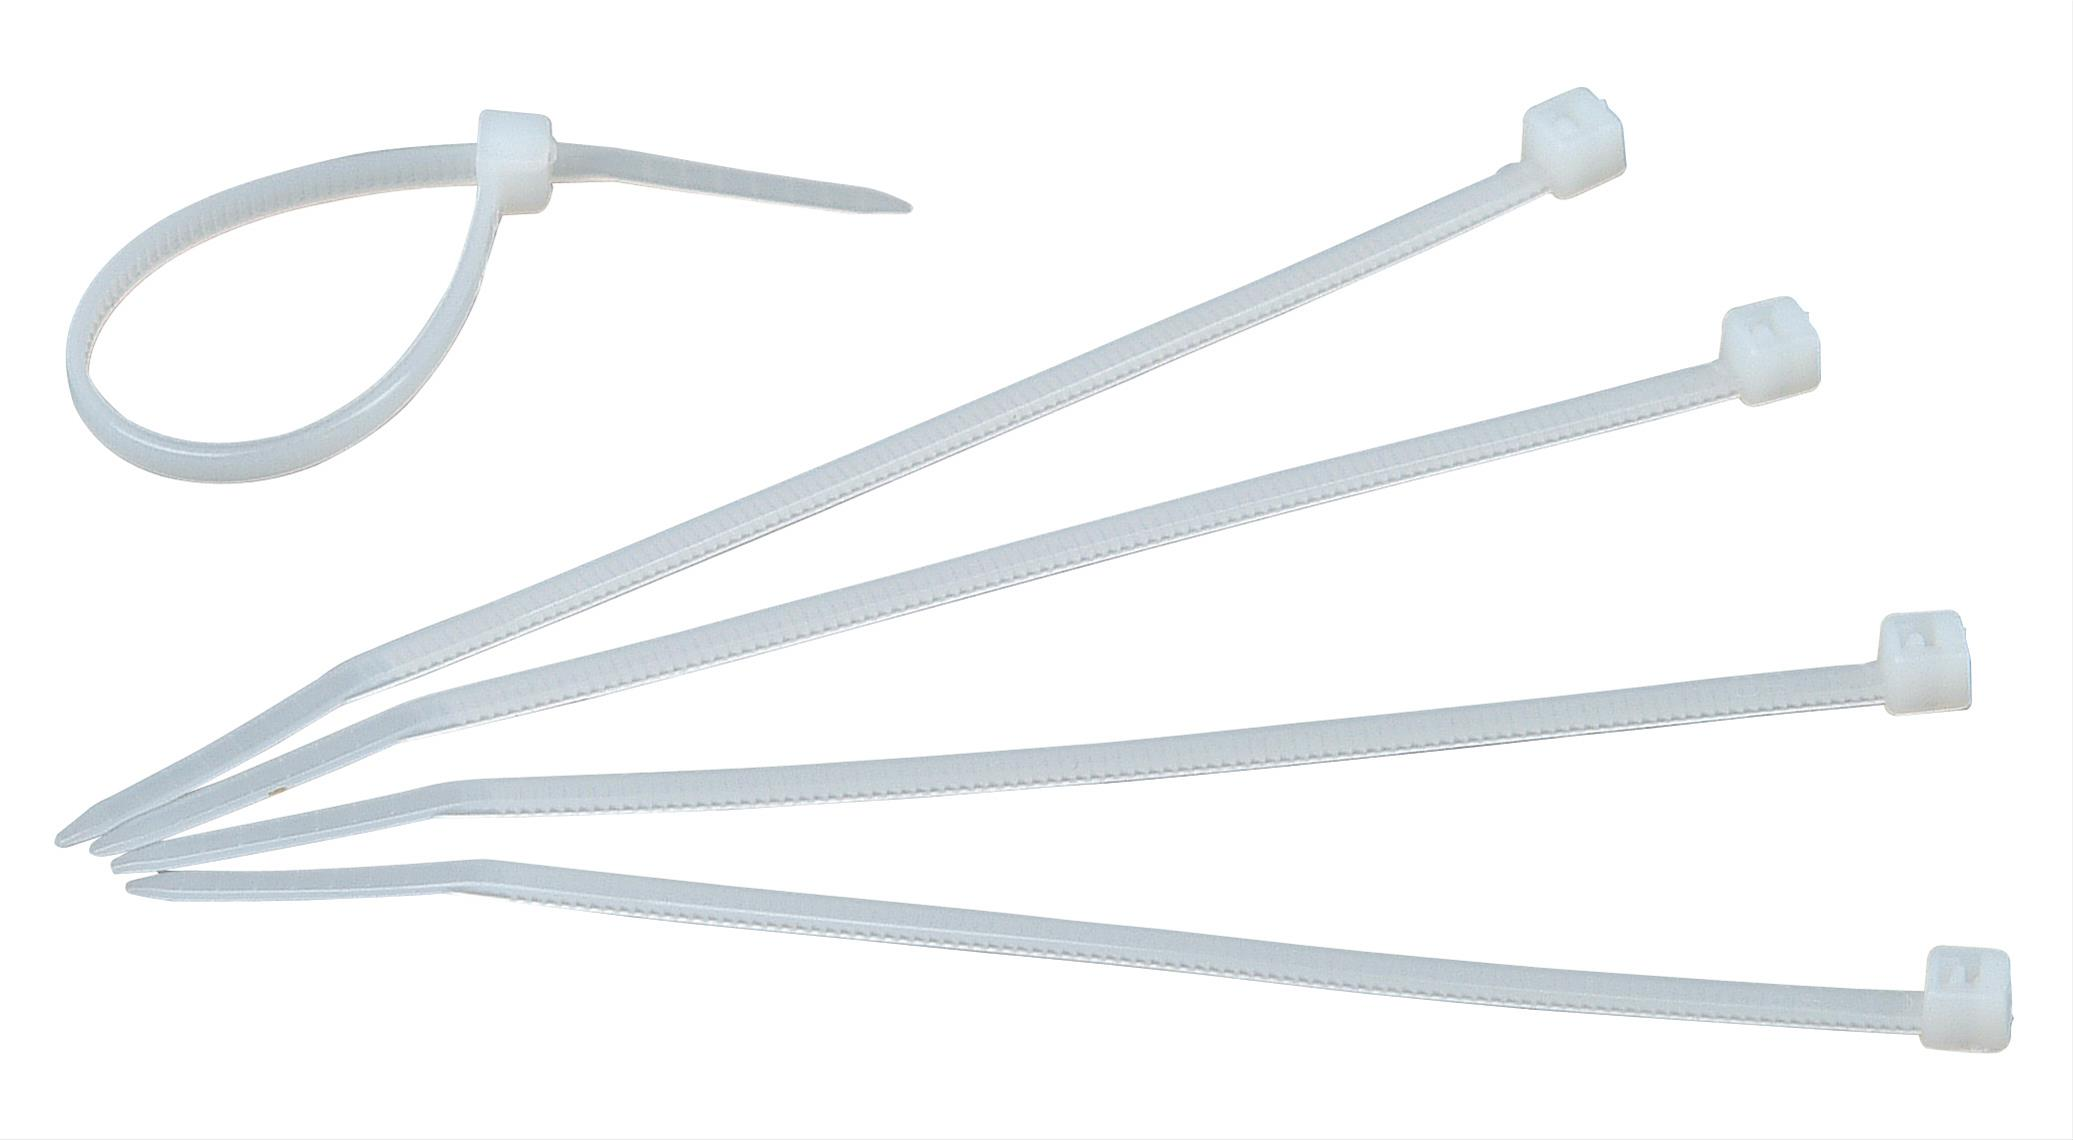 Kopp Kabelbinder transparent 100 x 2,5 mm 50 Stück Bild 1